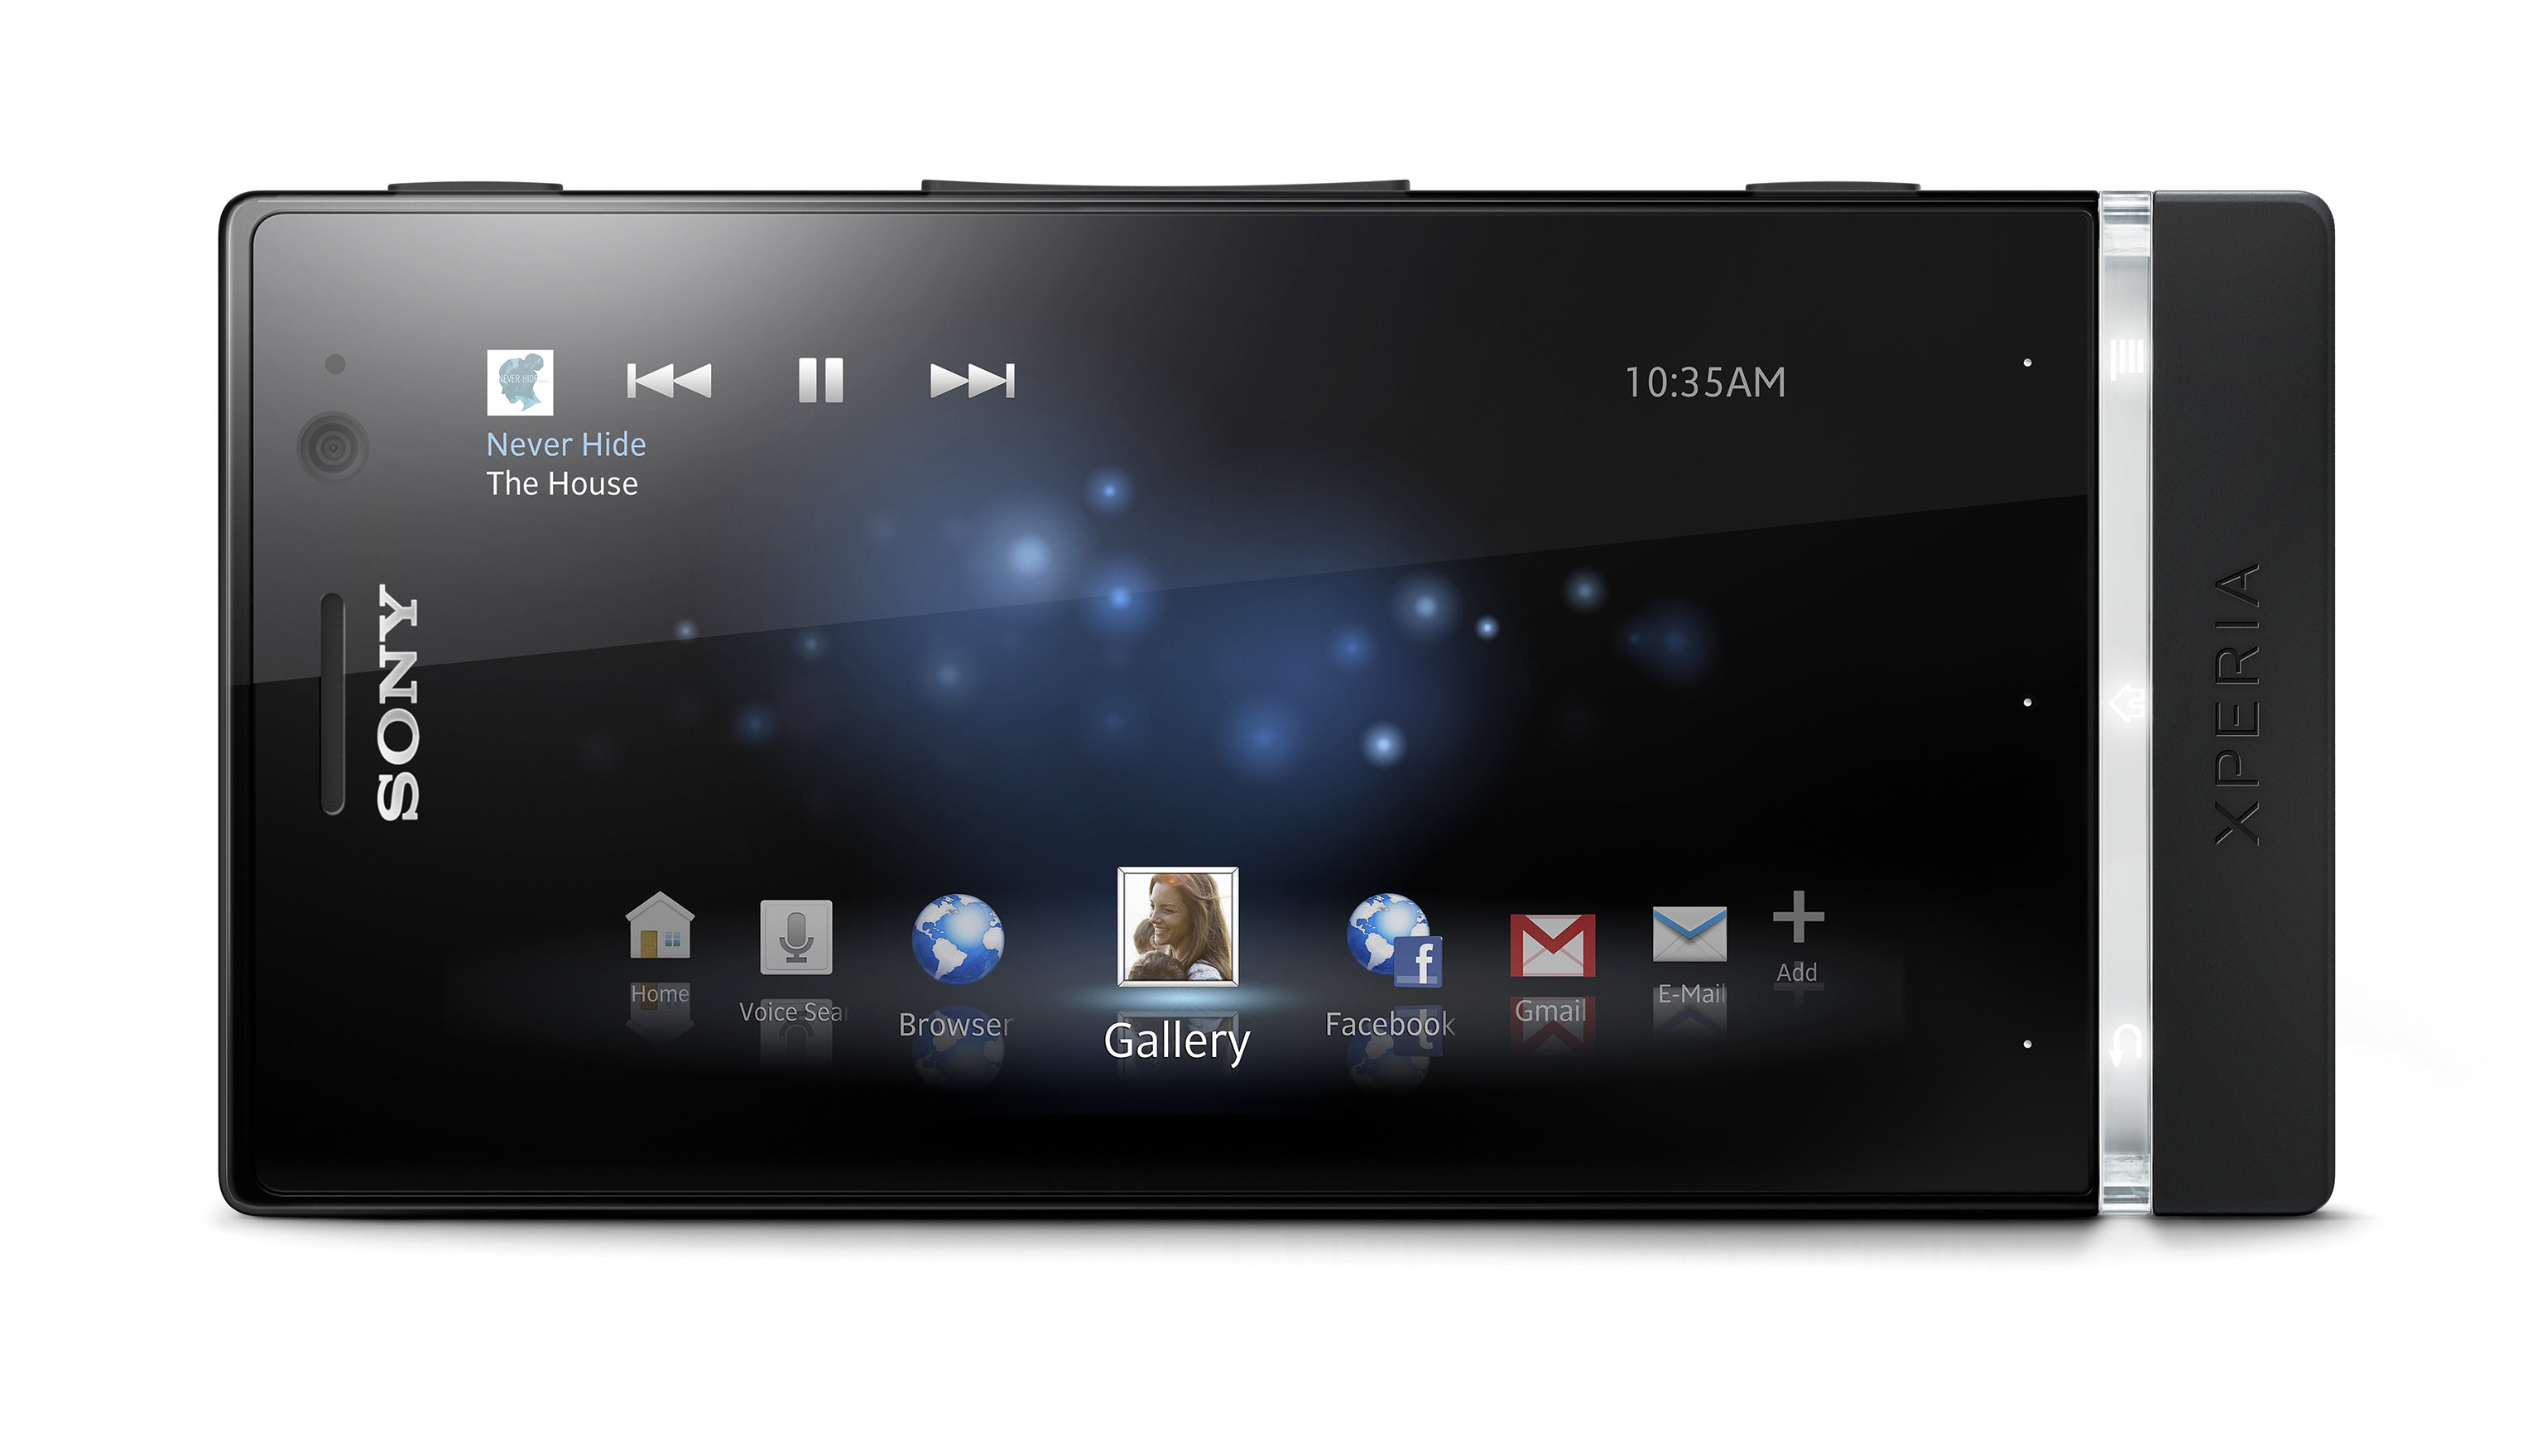 Sony Xperia U Sim Free Smartphone - Black: Amazon.co.uk: Electronics